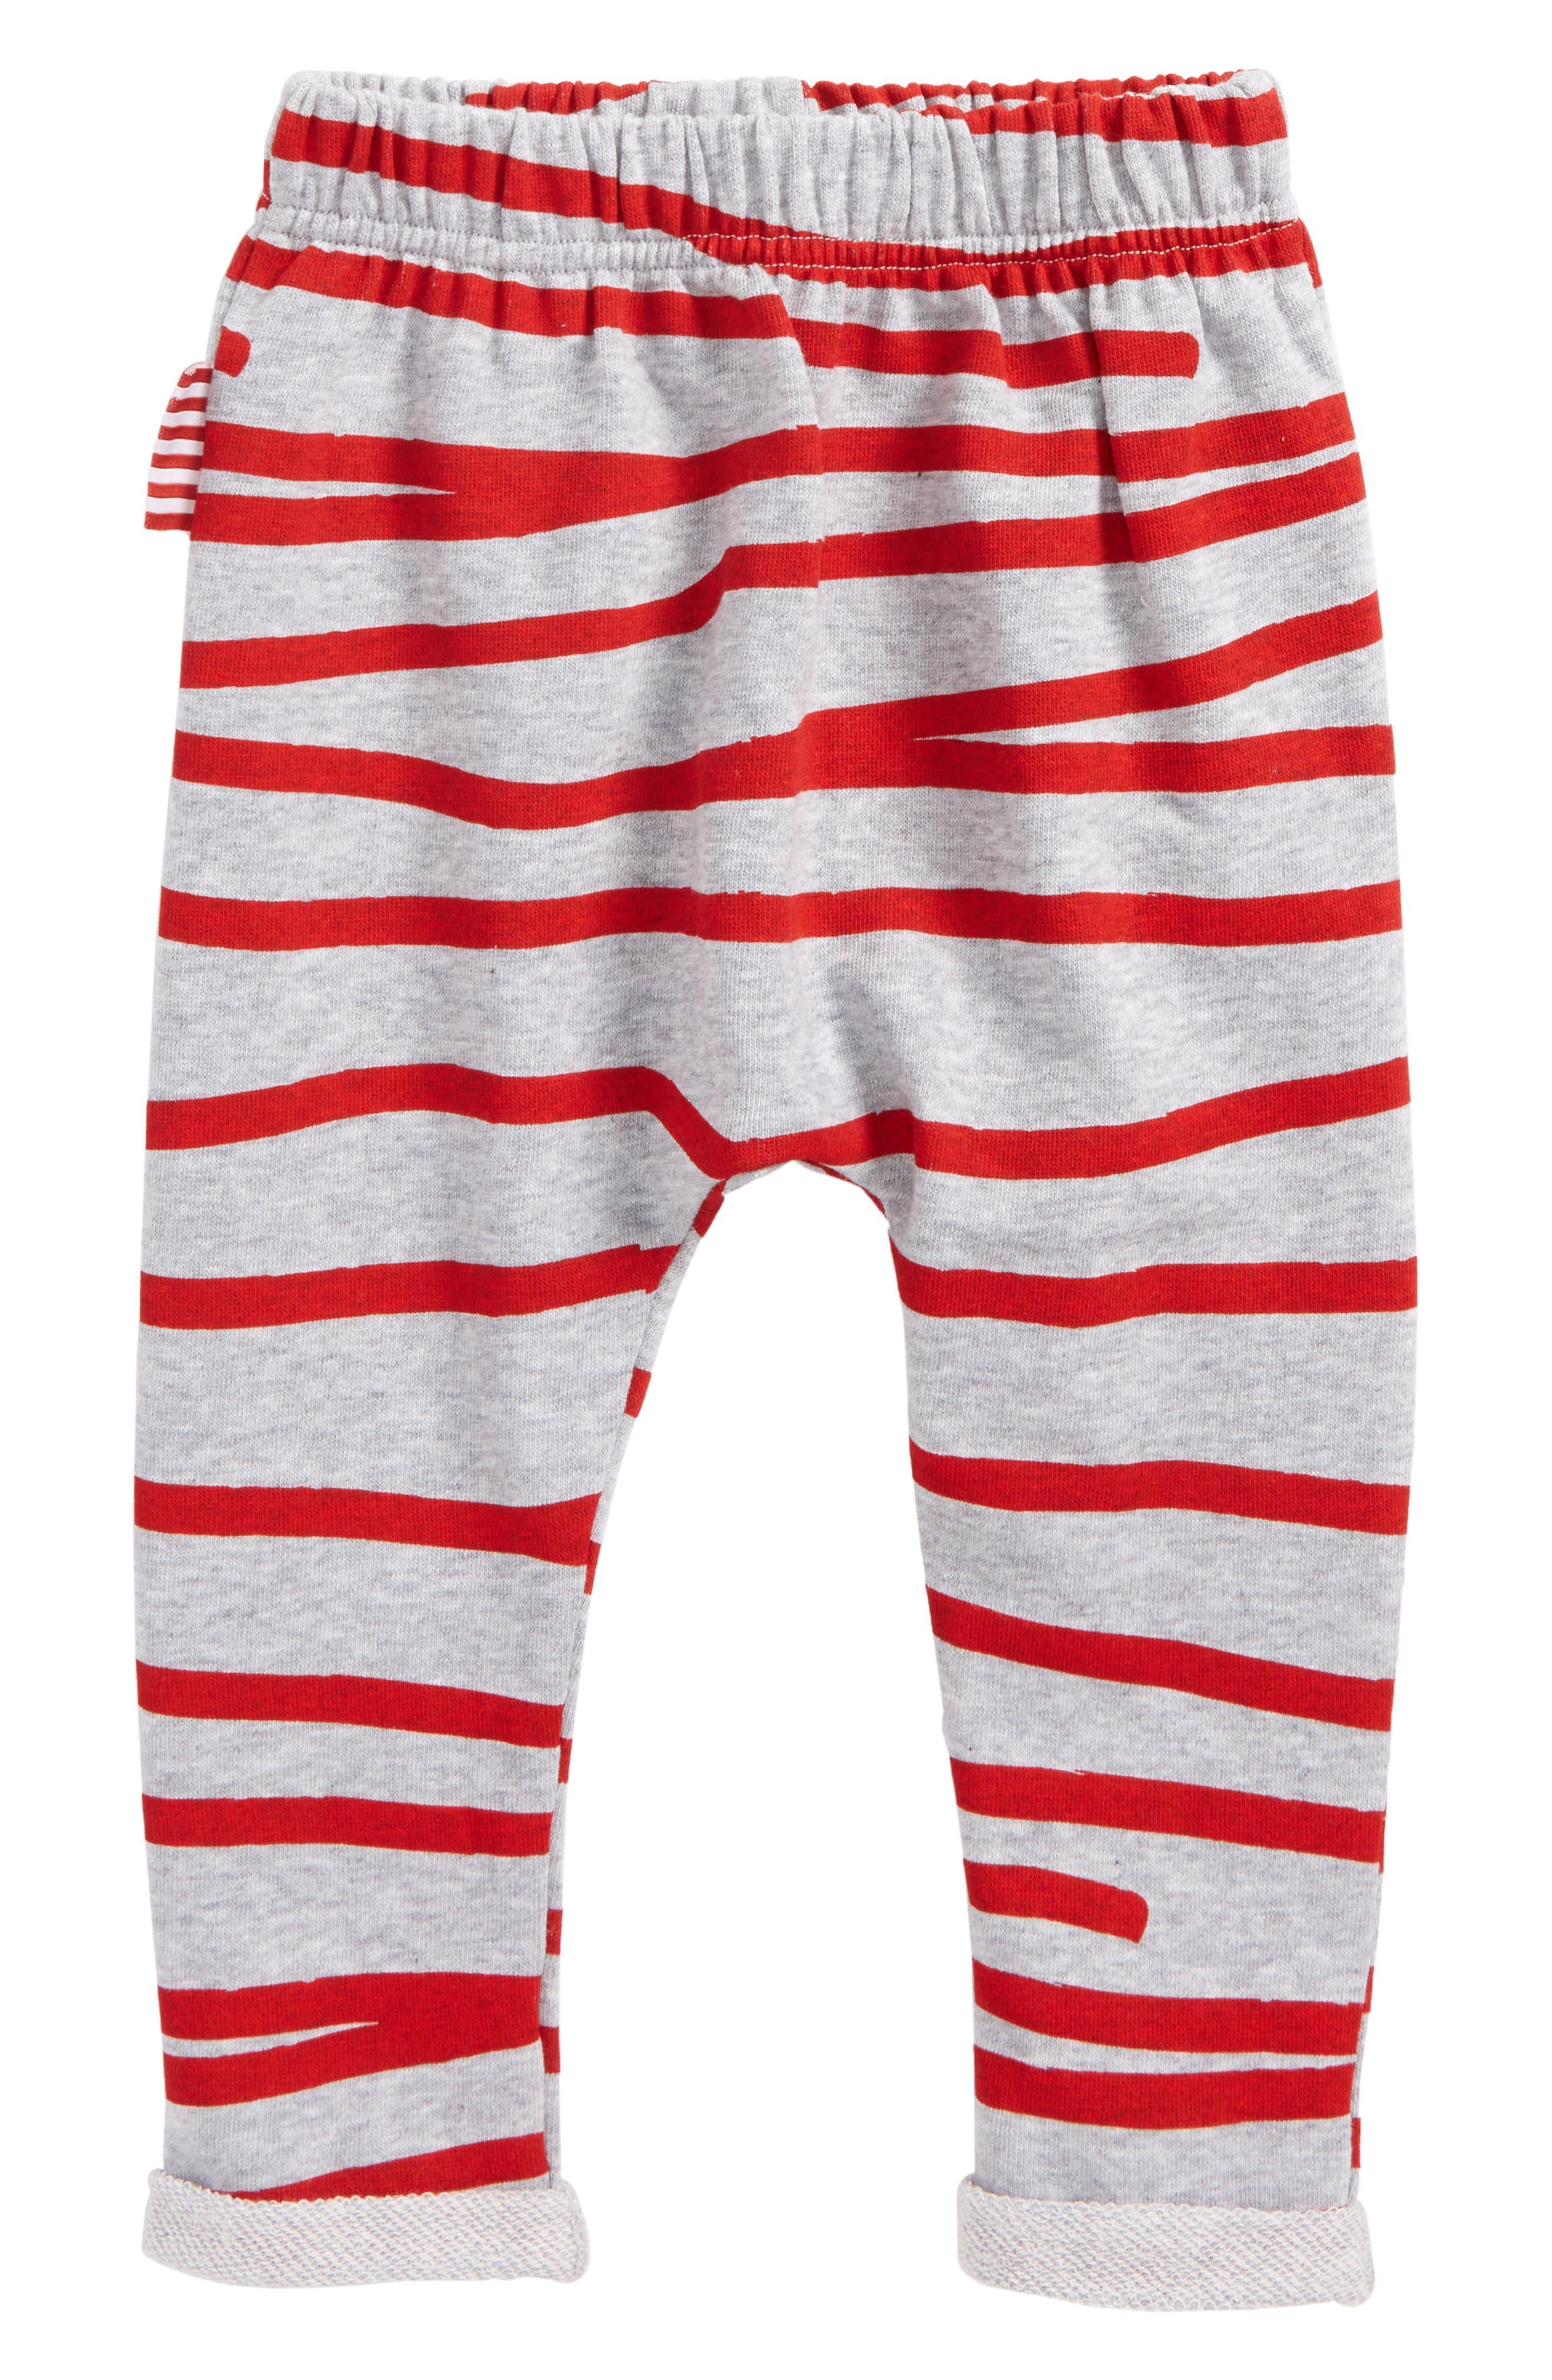 Main Image - SOOKIbaby Stripe Jogger Pants (Baby)